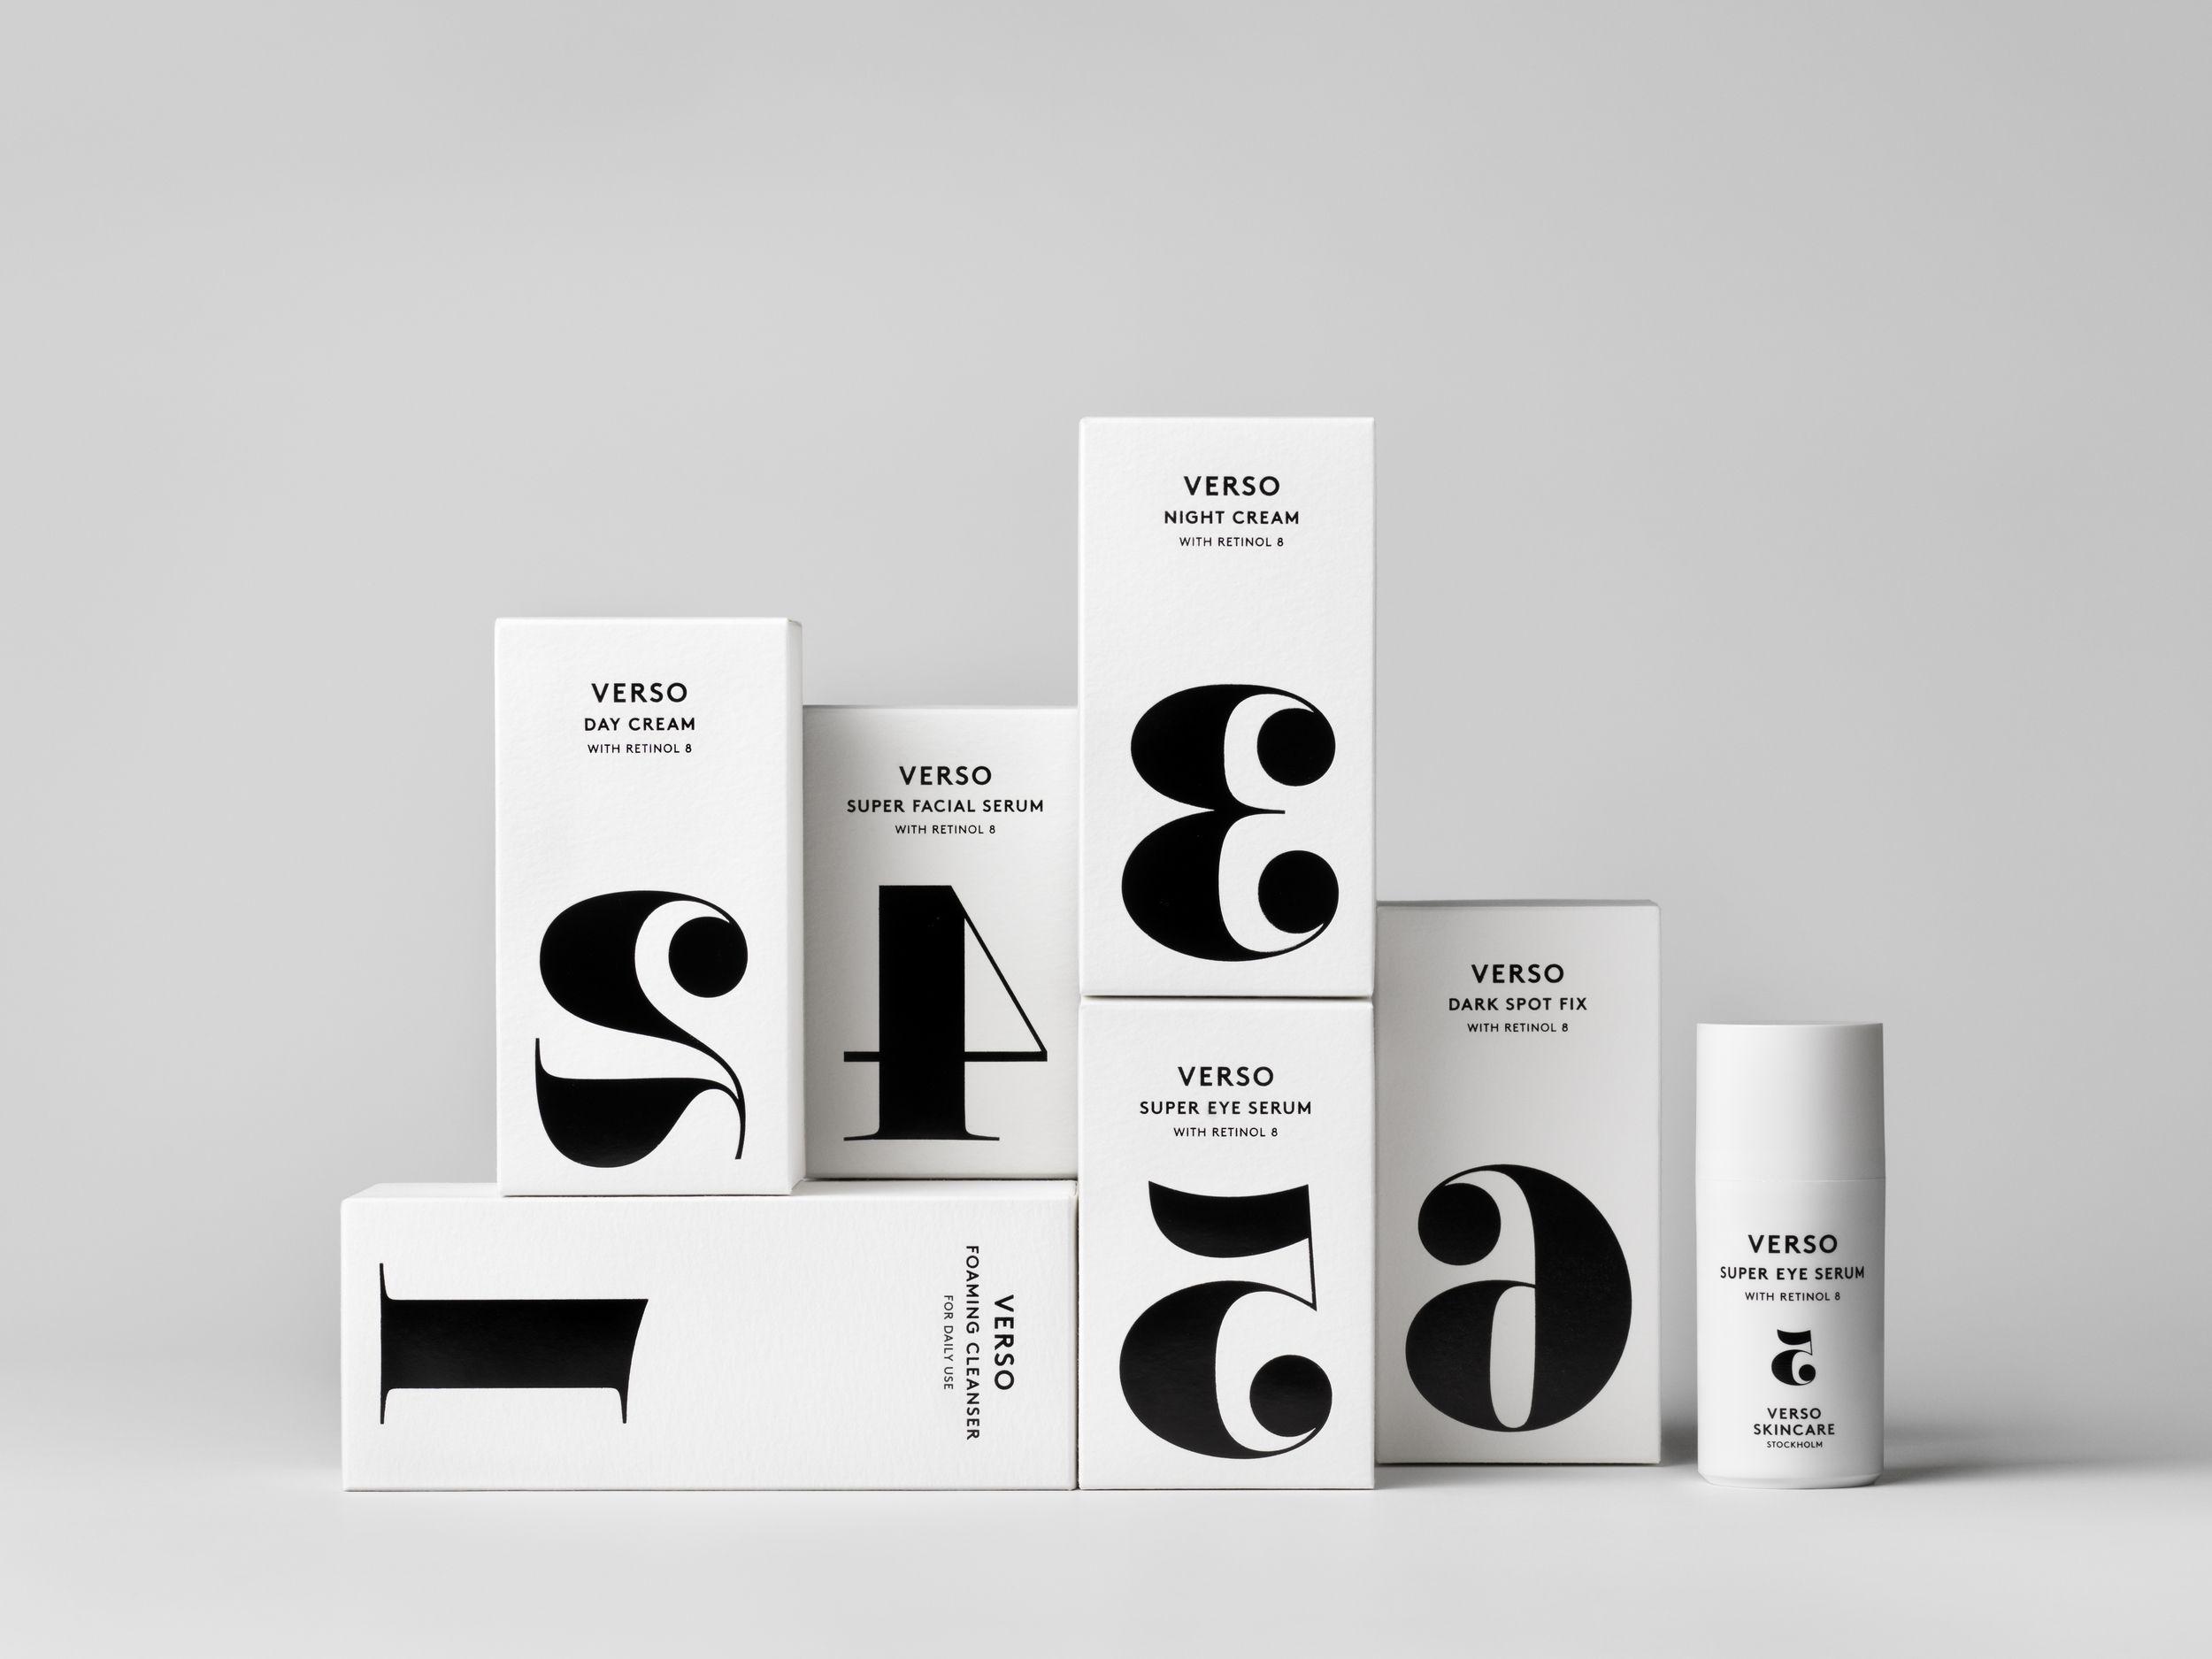 Image skincare stockholm